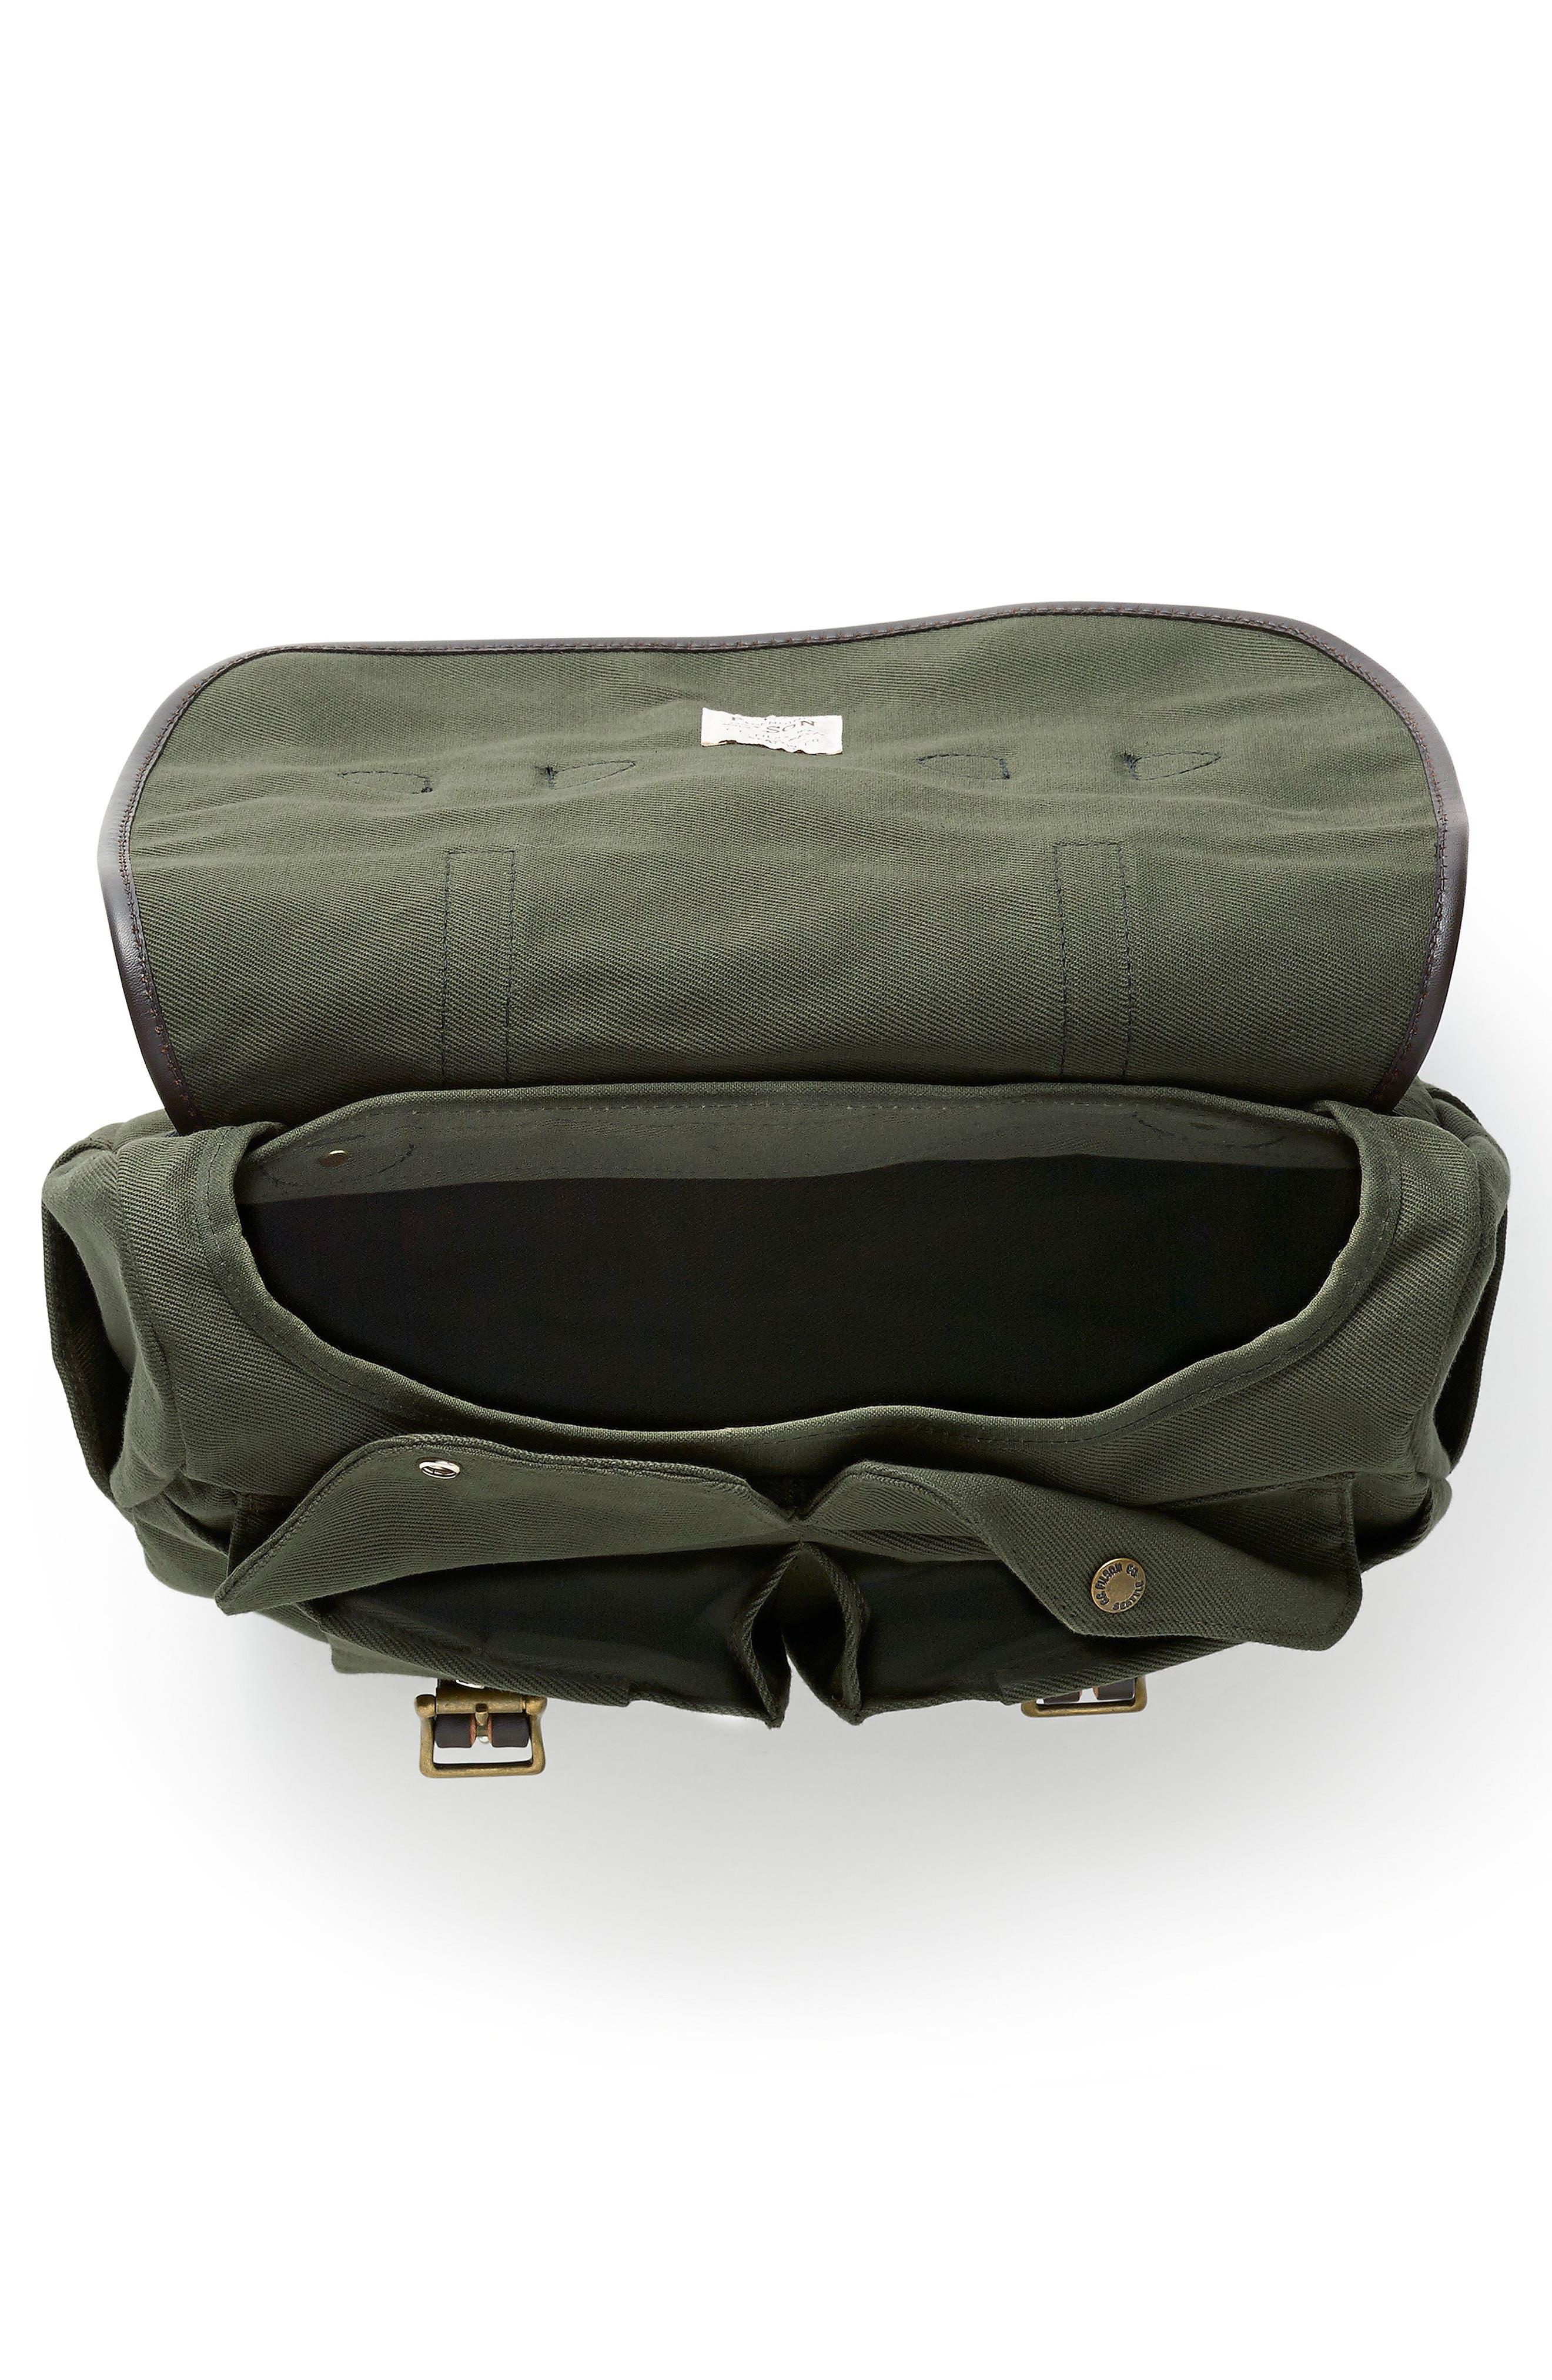 Medium Field Bag,                             Alternate thumbnail 3, color,                             Otter Green